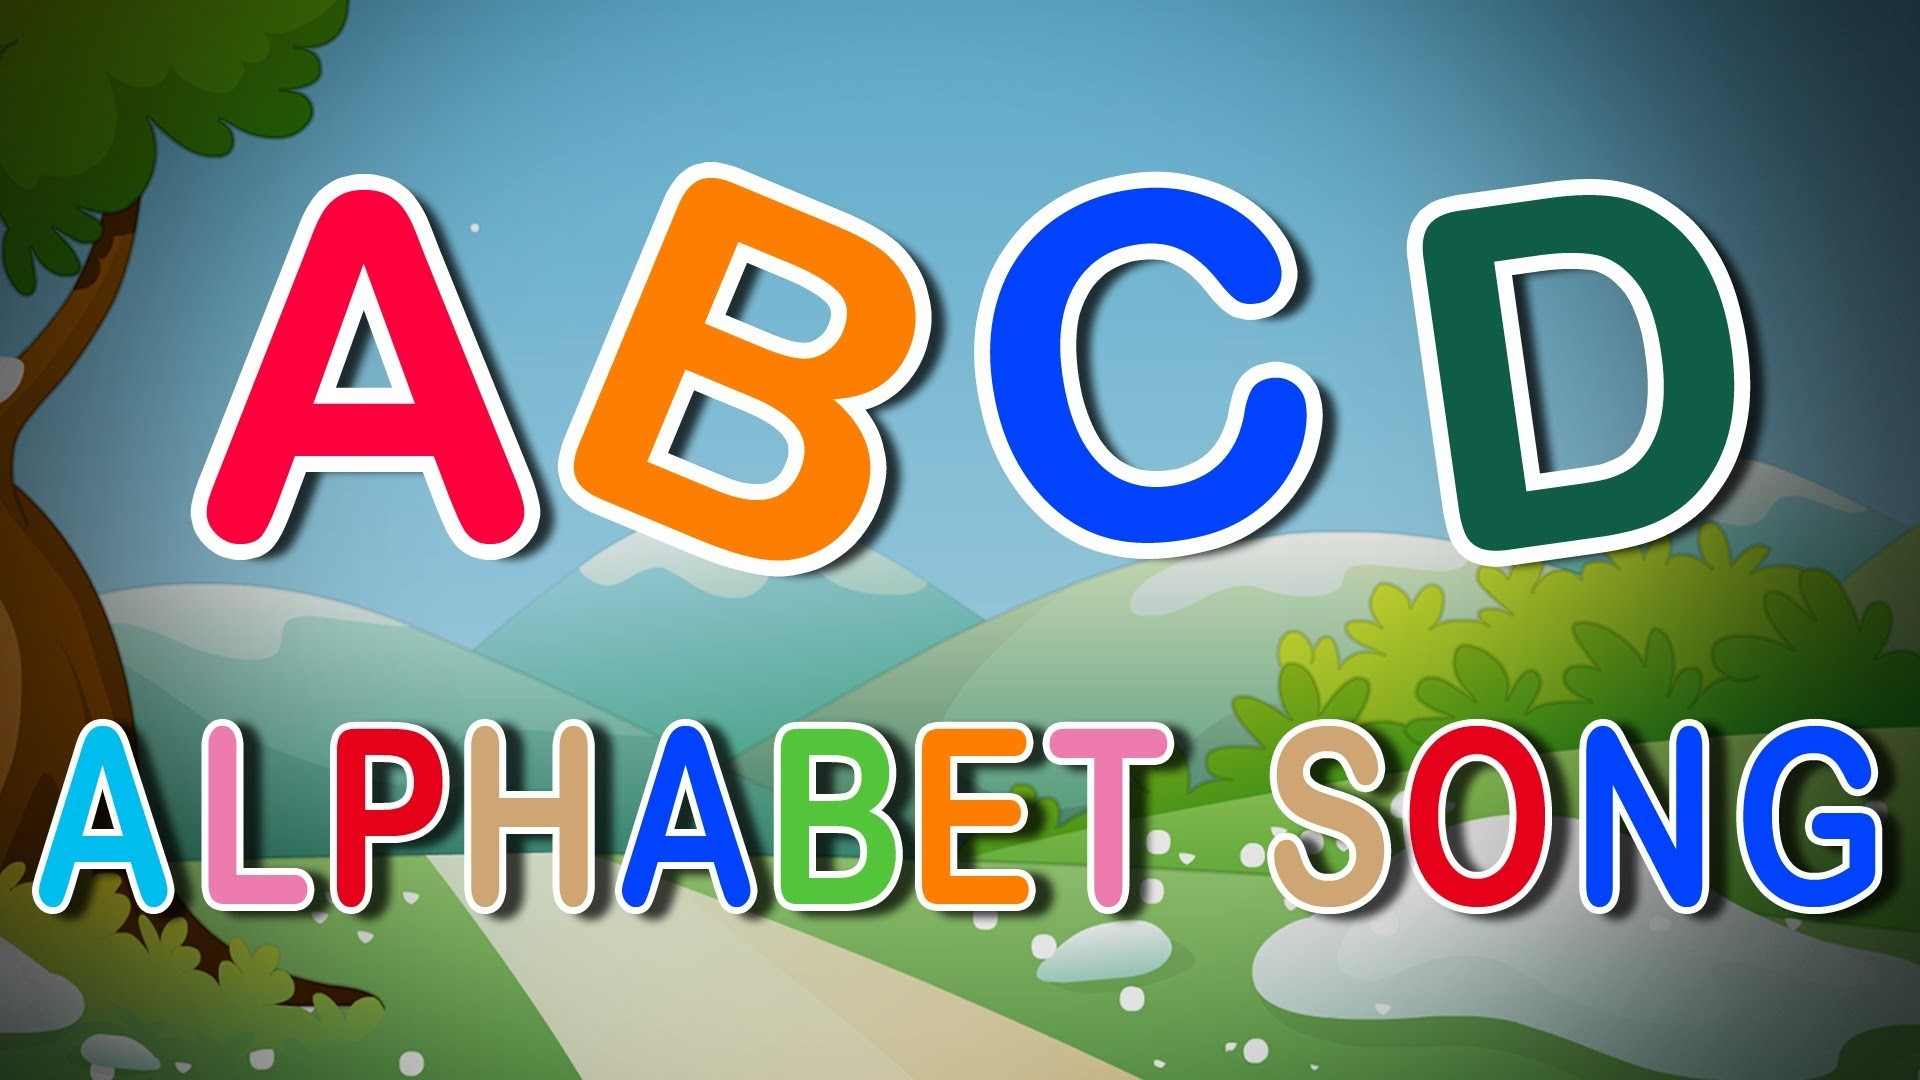 Phonetic Alphabet Wallpaper (56+ images)